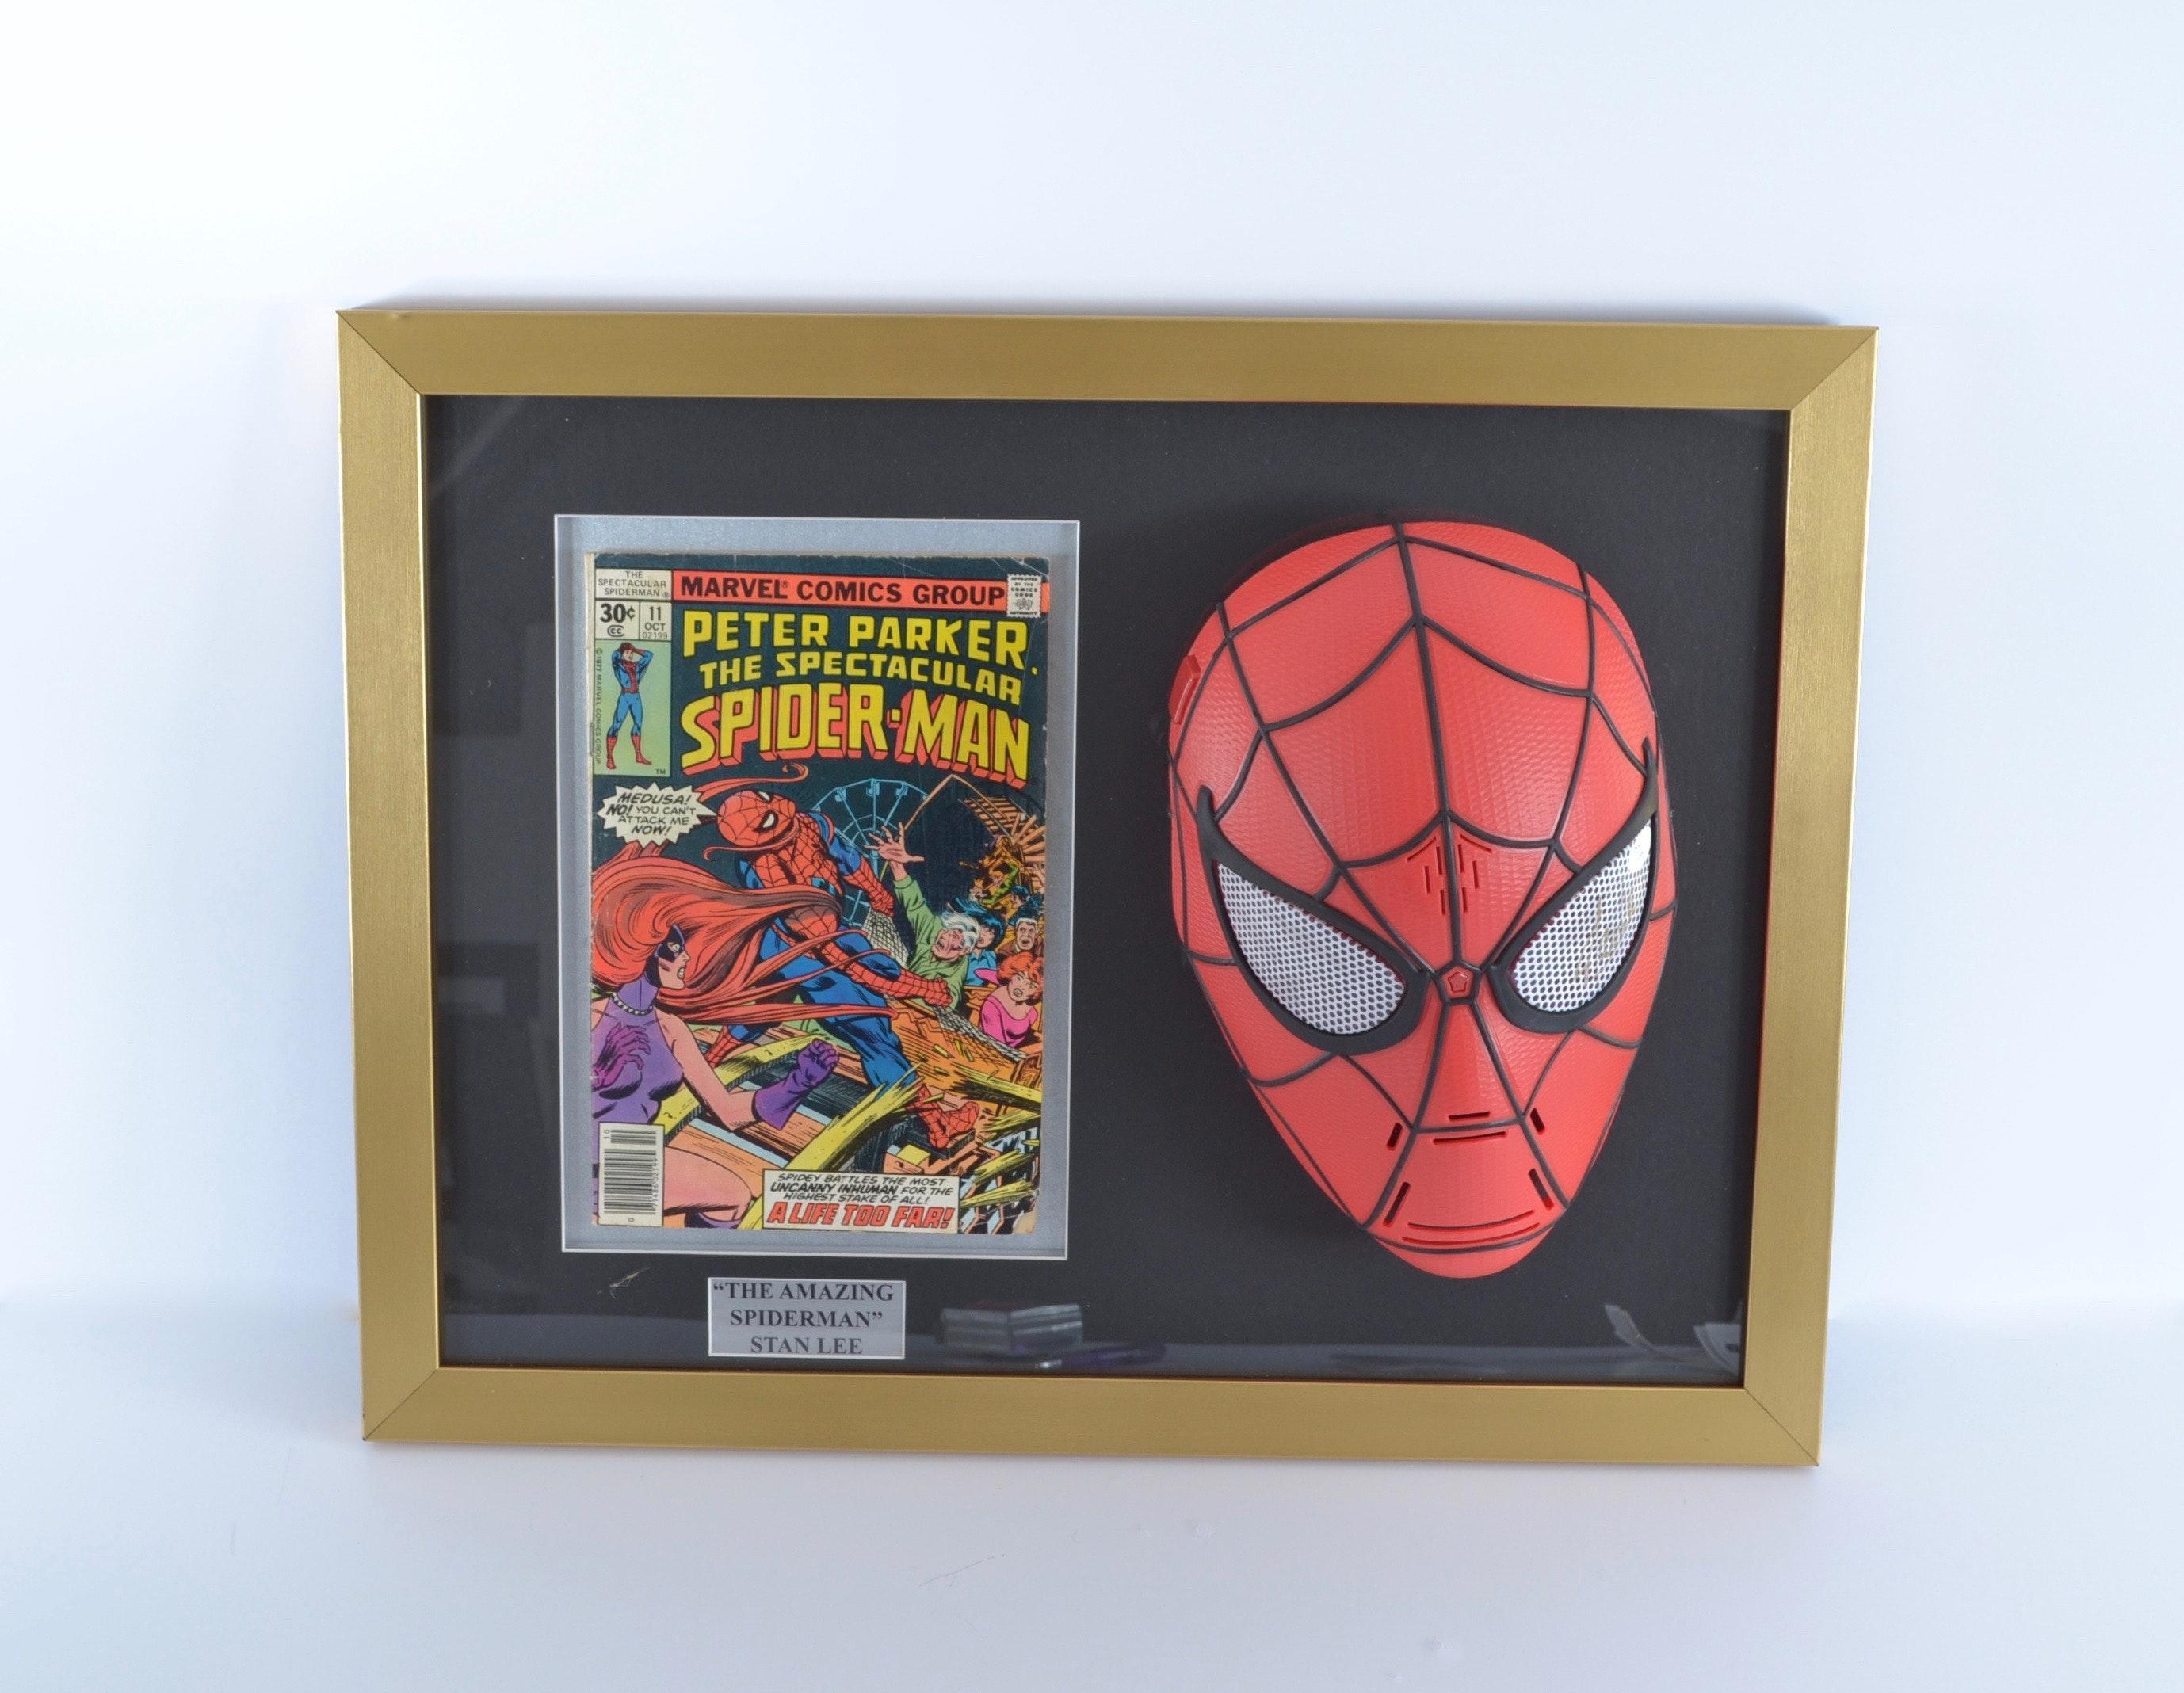 Stan Lee Autographed Spiderman Display - JSA COA